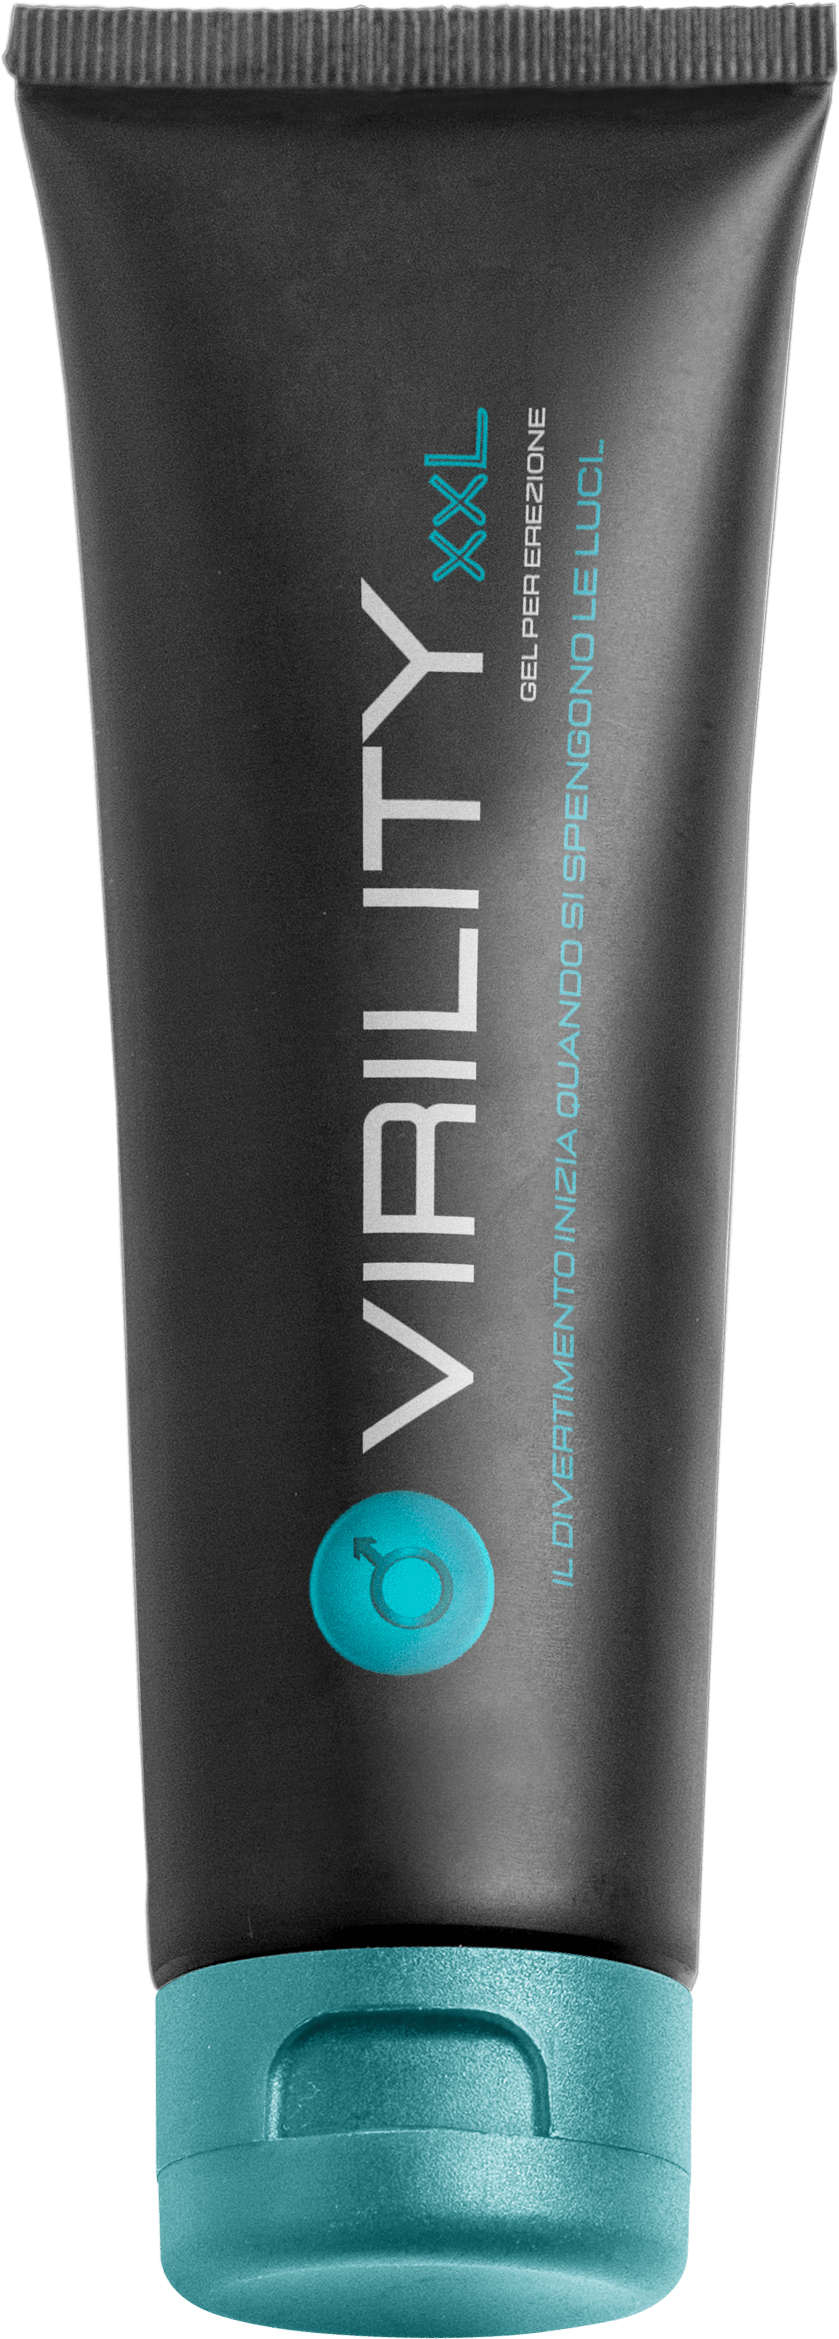 Virility XXL Gel, forum, commenti, opinioni, recensioni